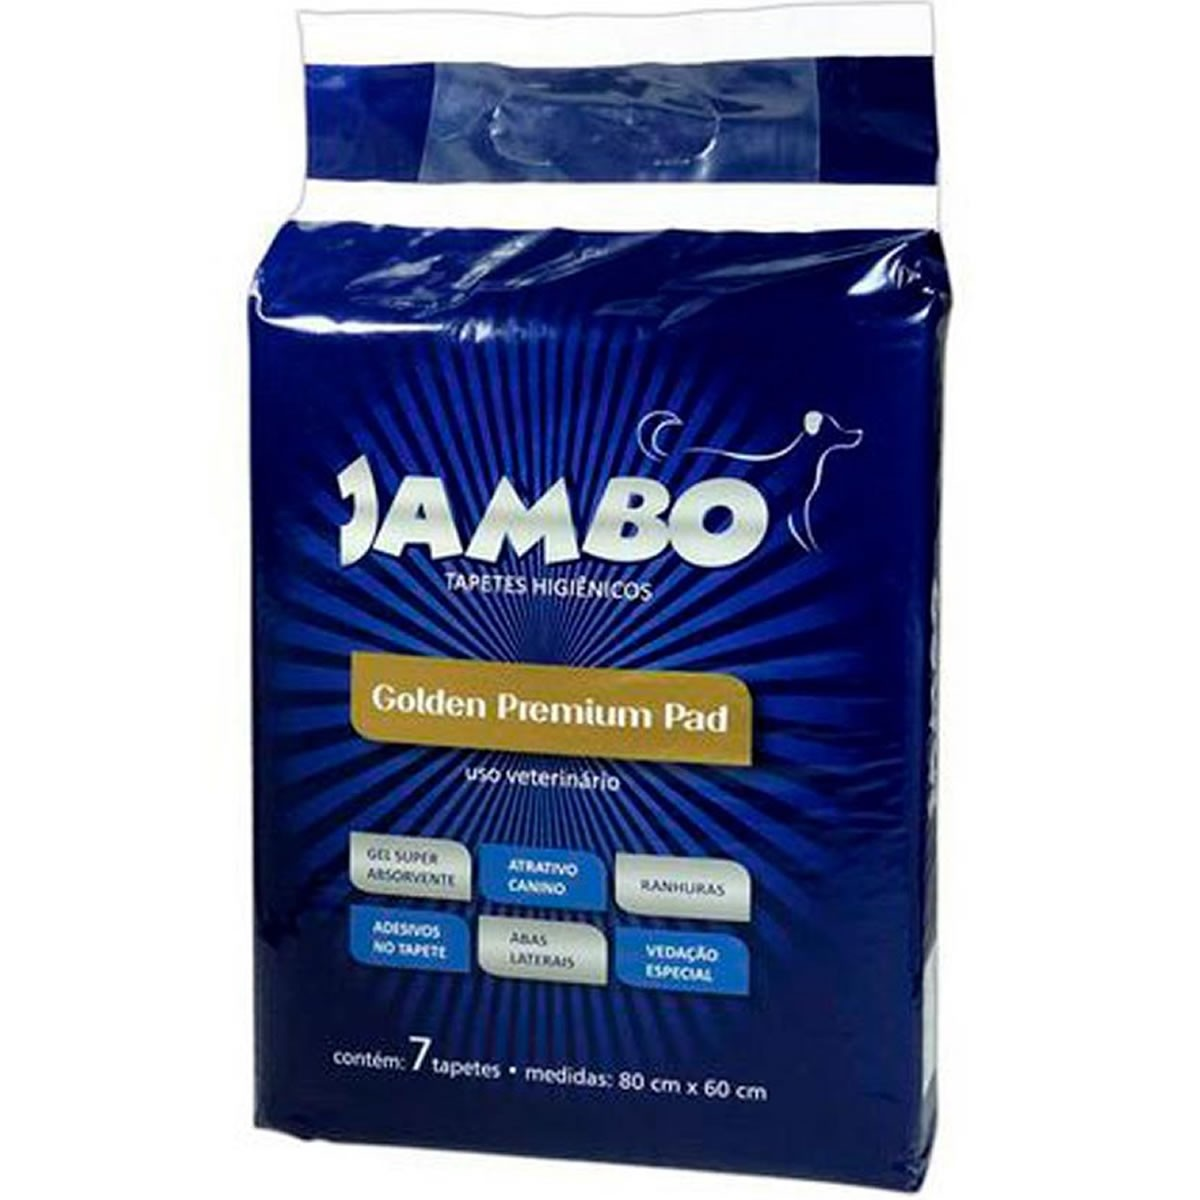 Tapete Higiênico Golden Premium Pad para Cães Jambo